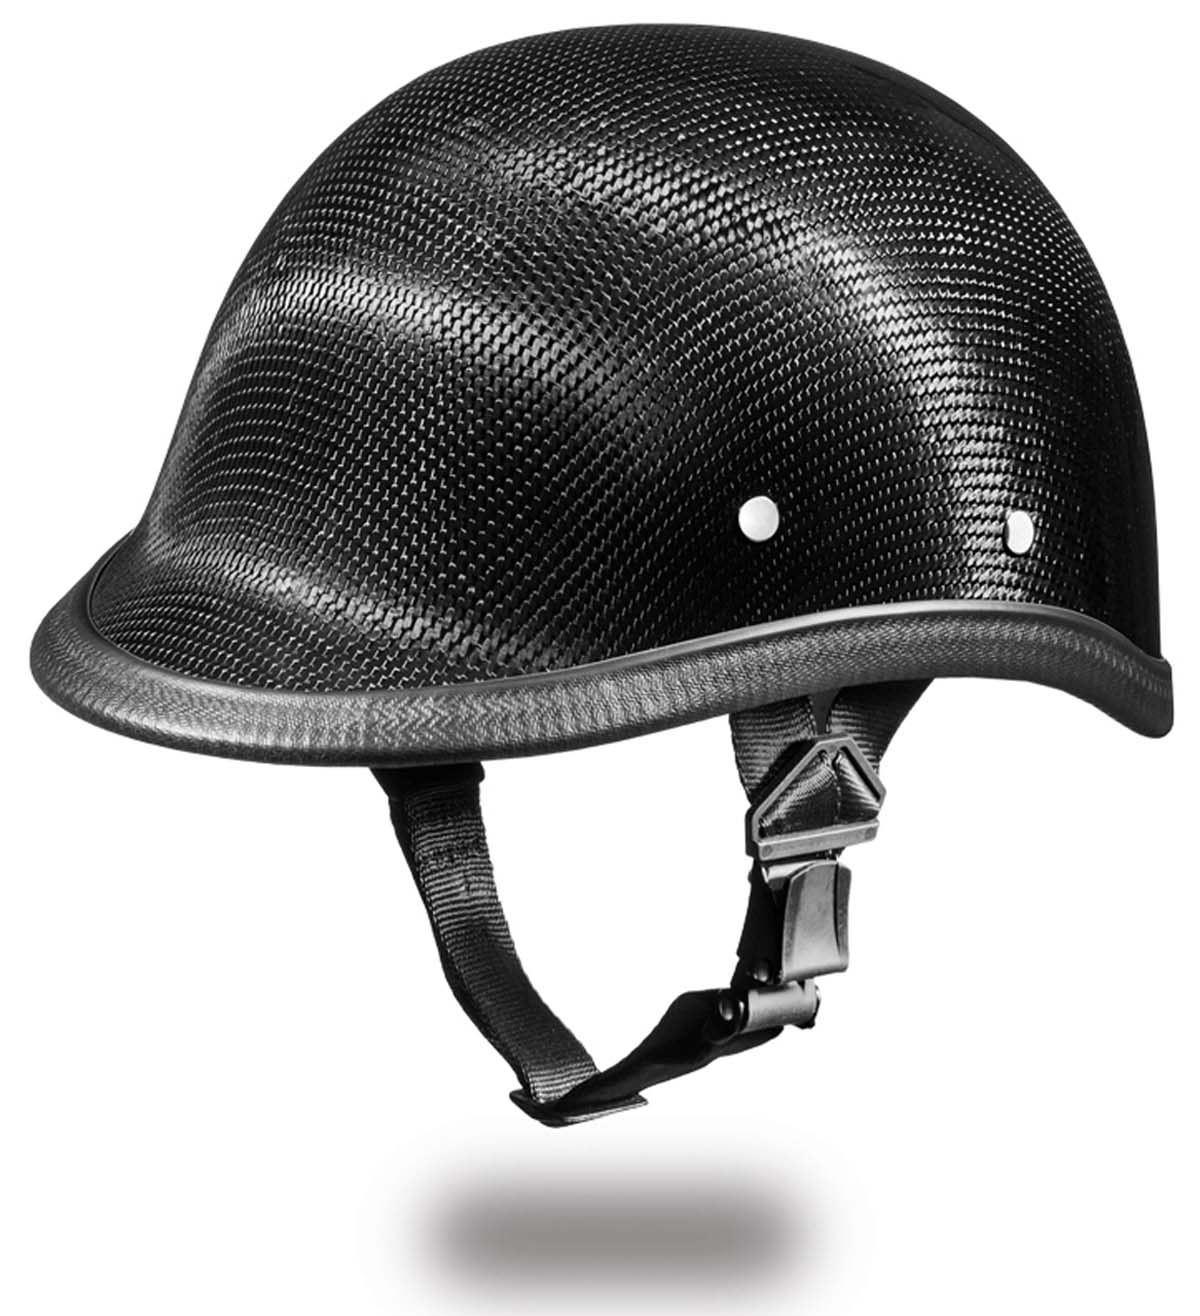 Daytona Hawk Novelty Helmet Polo - 192.6KB